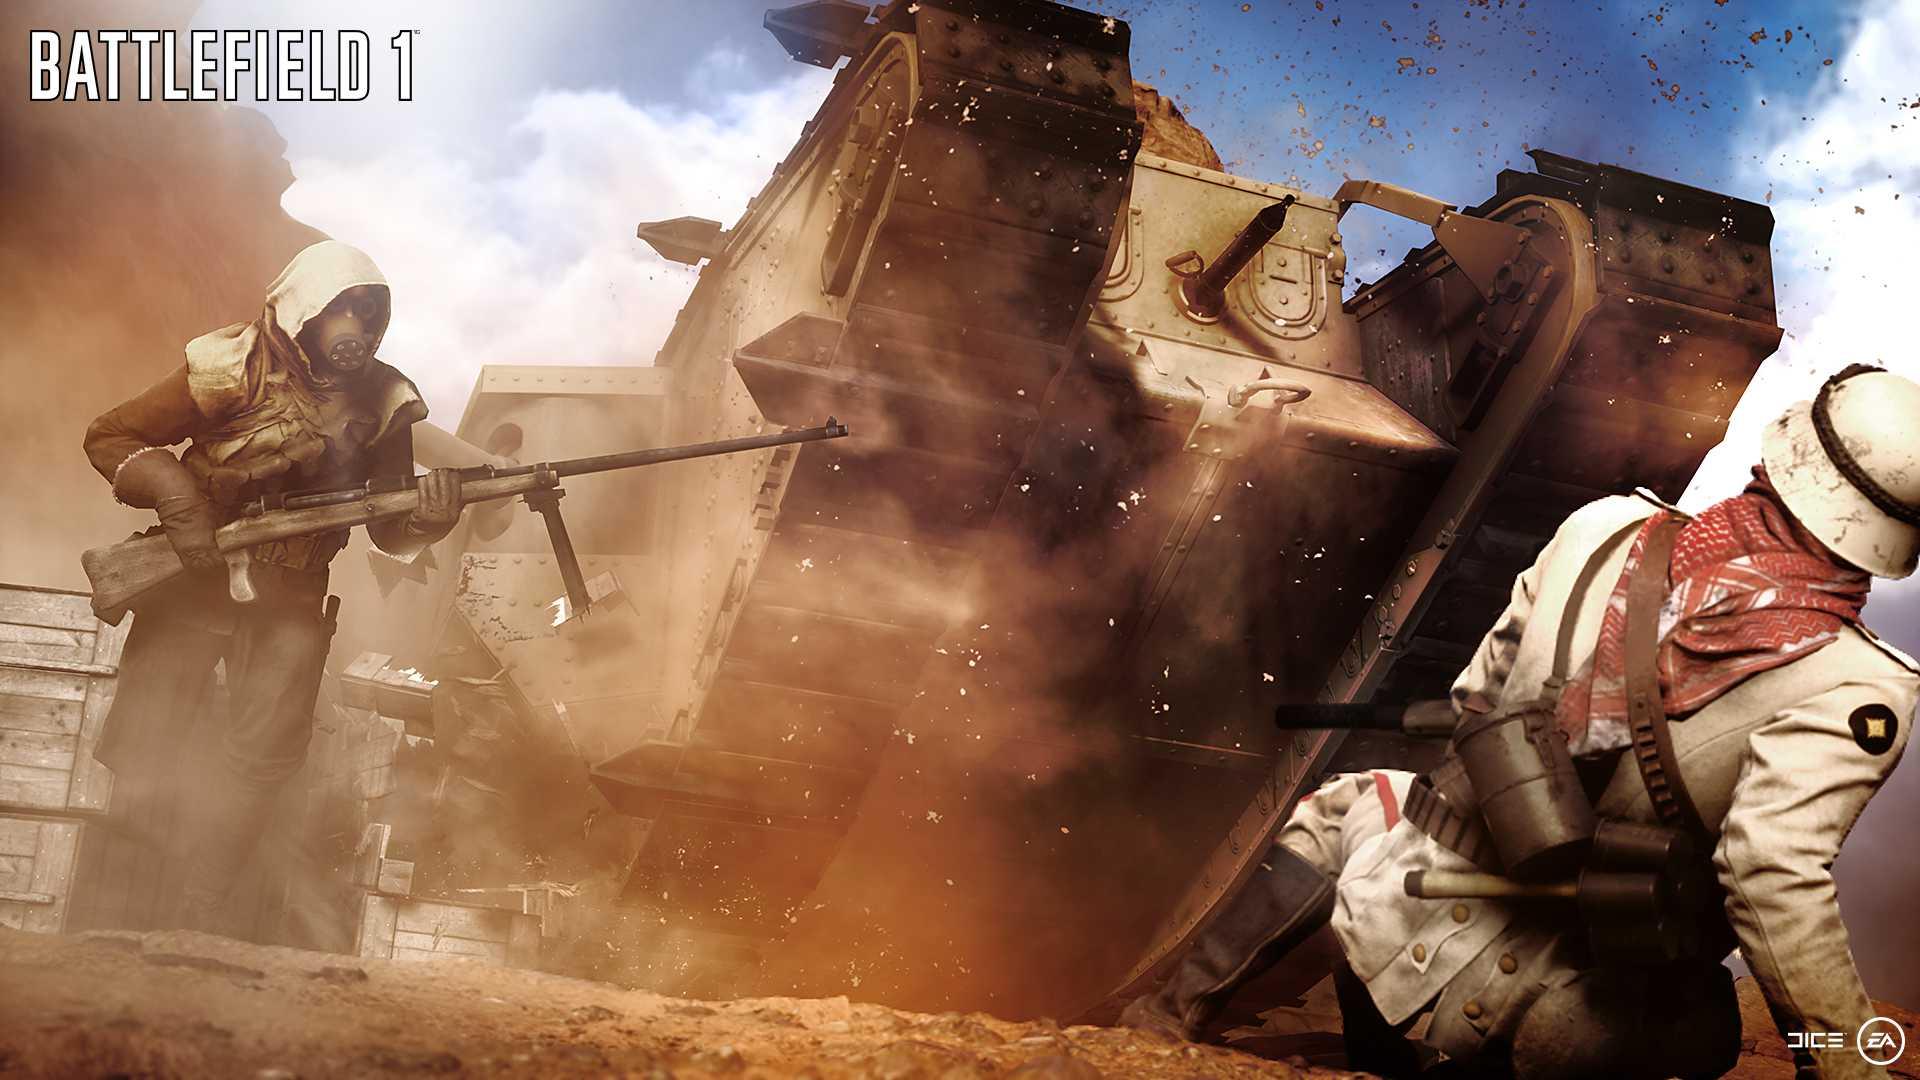 Star Wars Battlefront Sequel 'Much Bigger' Says EA